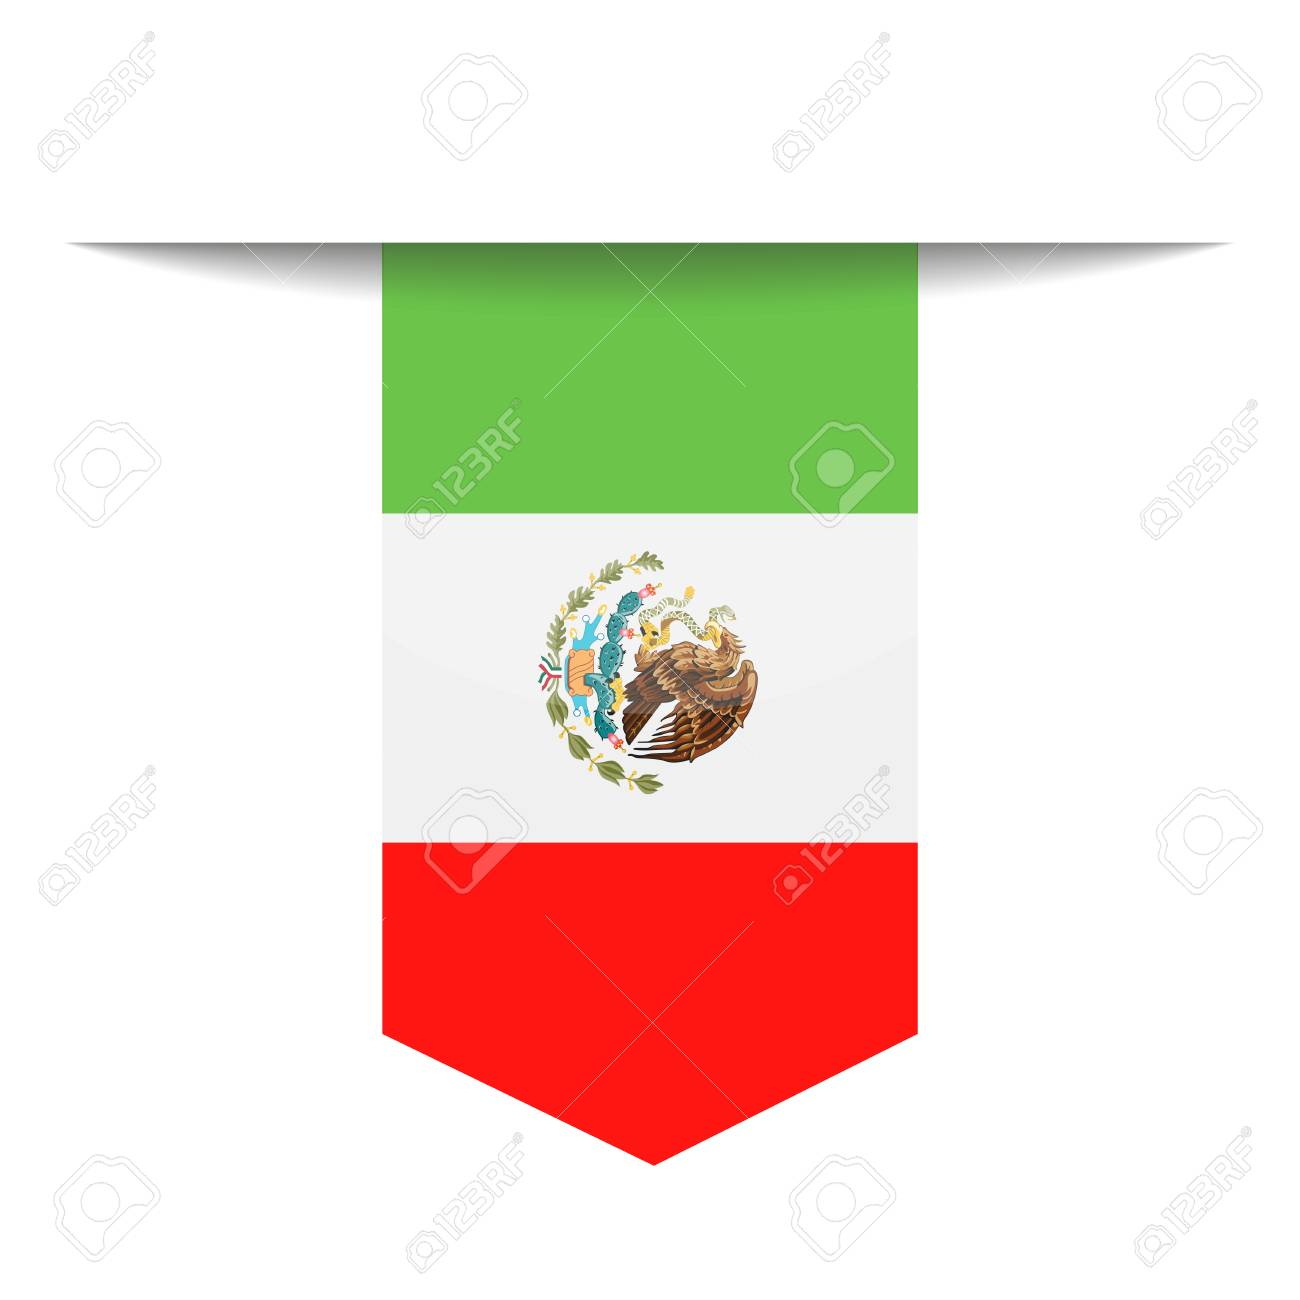 mexico flag vector bookmark icon illustration royalty free rh 123rf com mexican flag vector mexican flag vector free